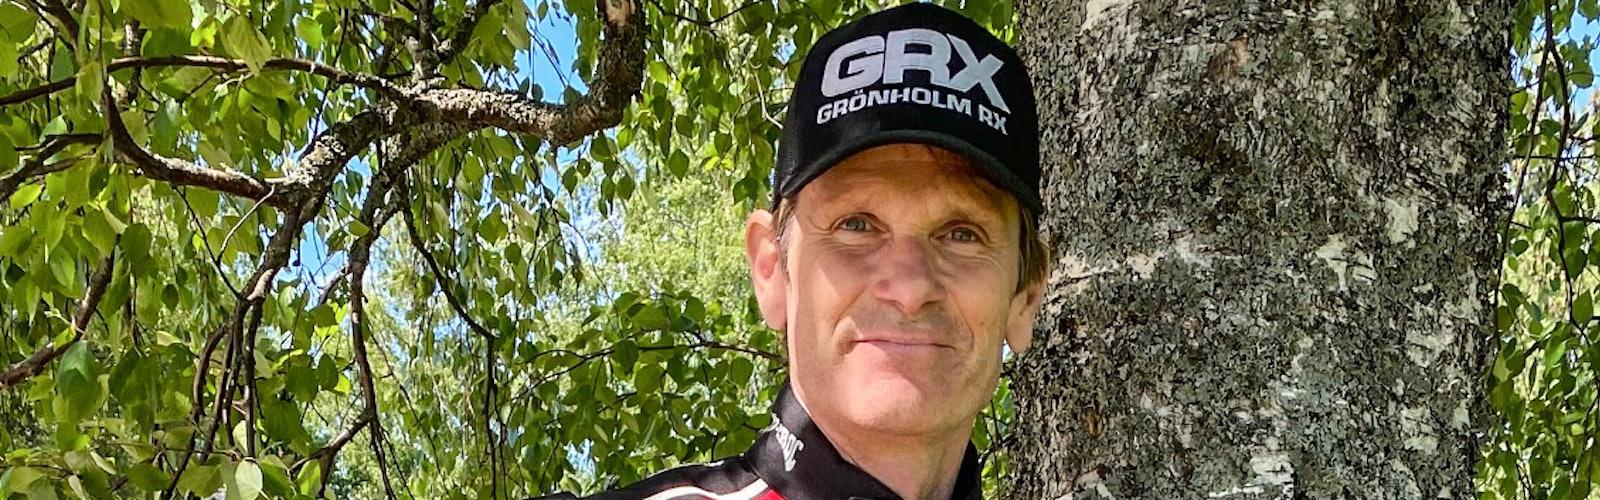 RallyXNordicGronholm